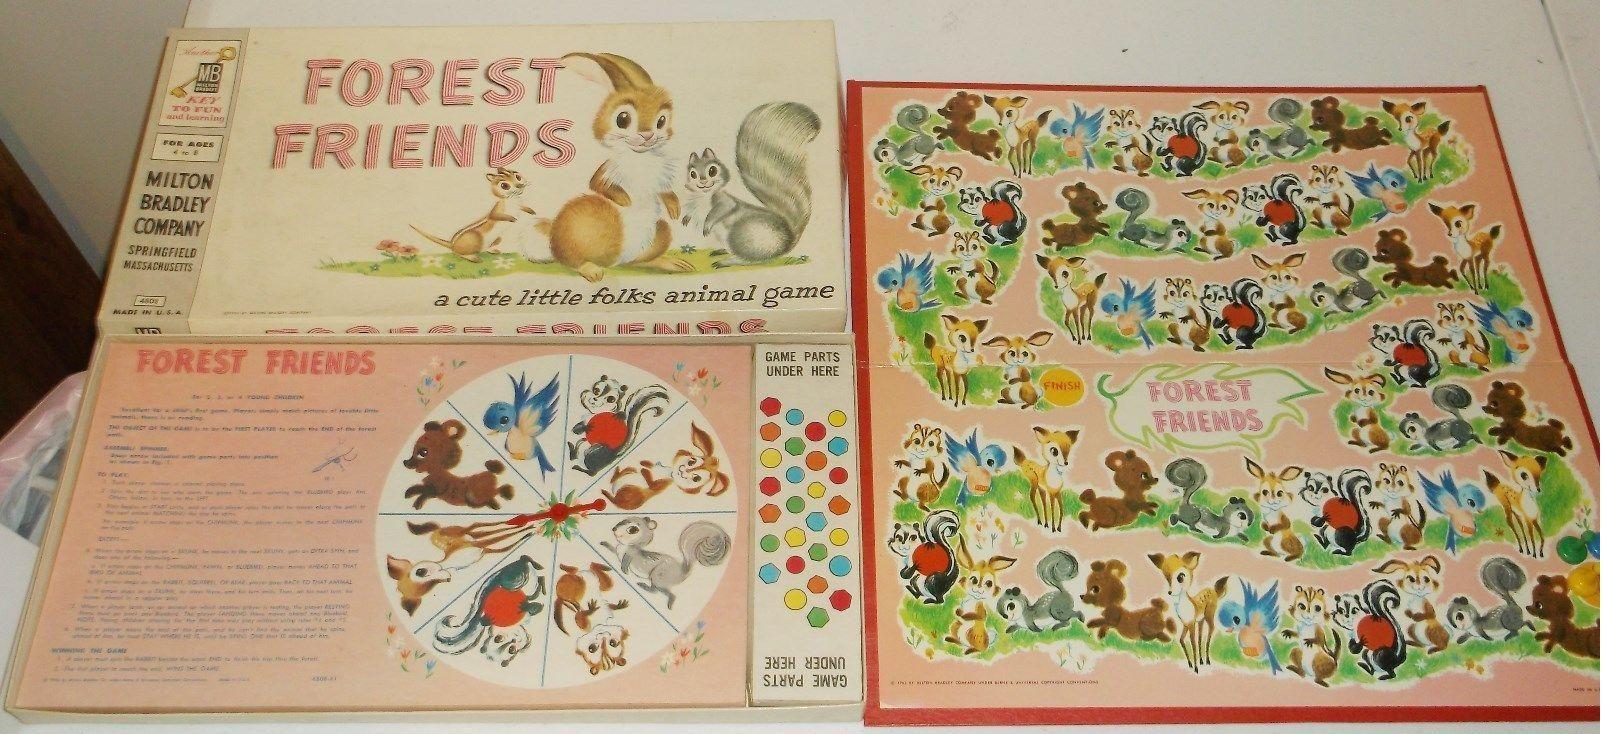 Vintage Milton Bradley 1956 Forest Friends Board Game Used